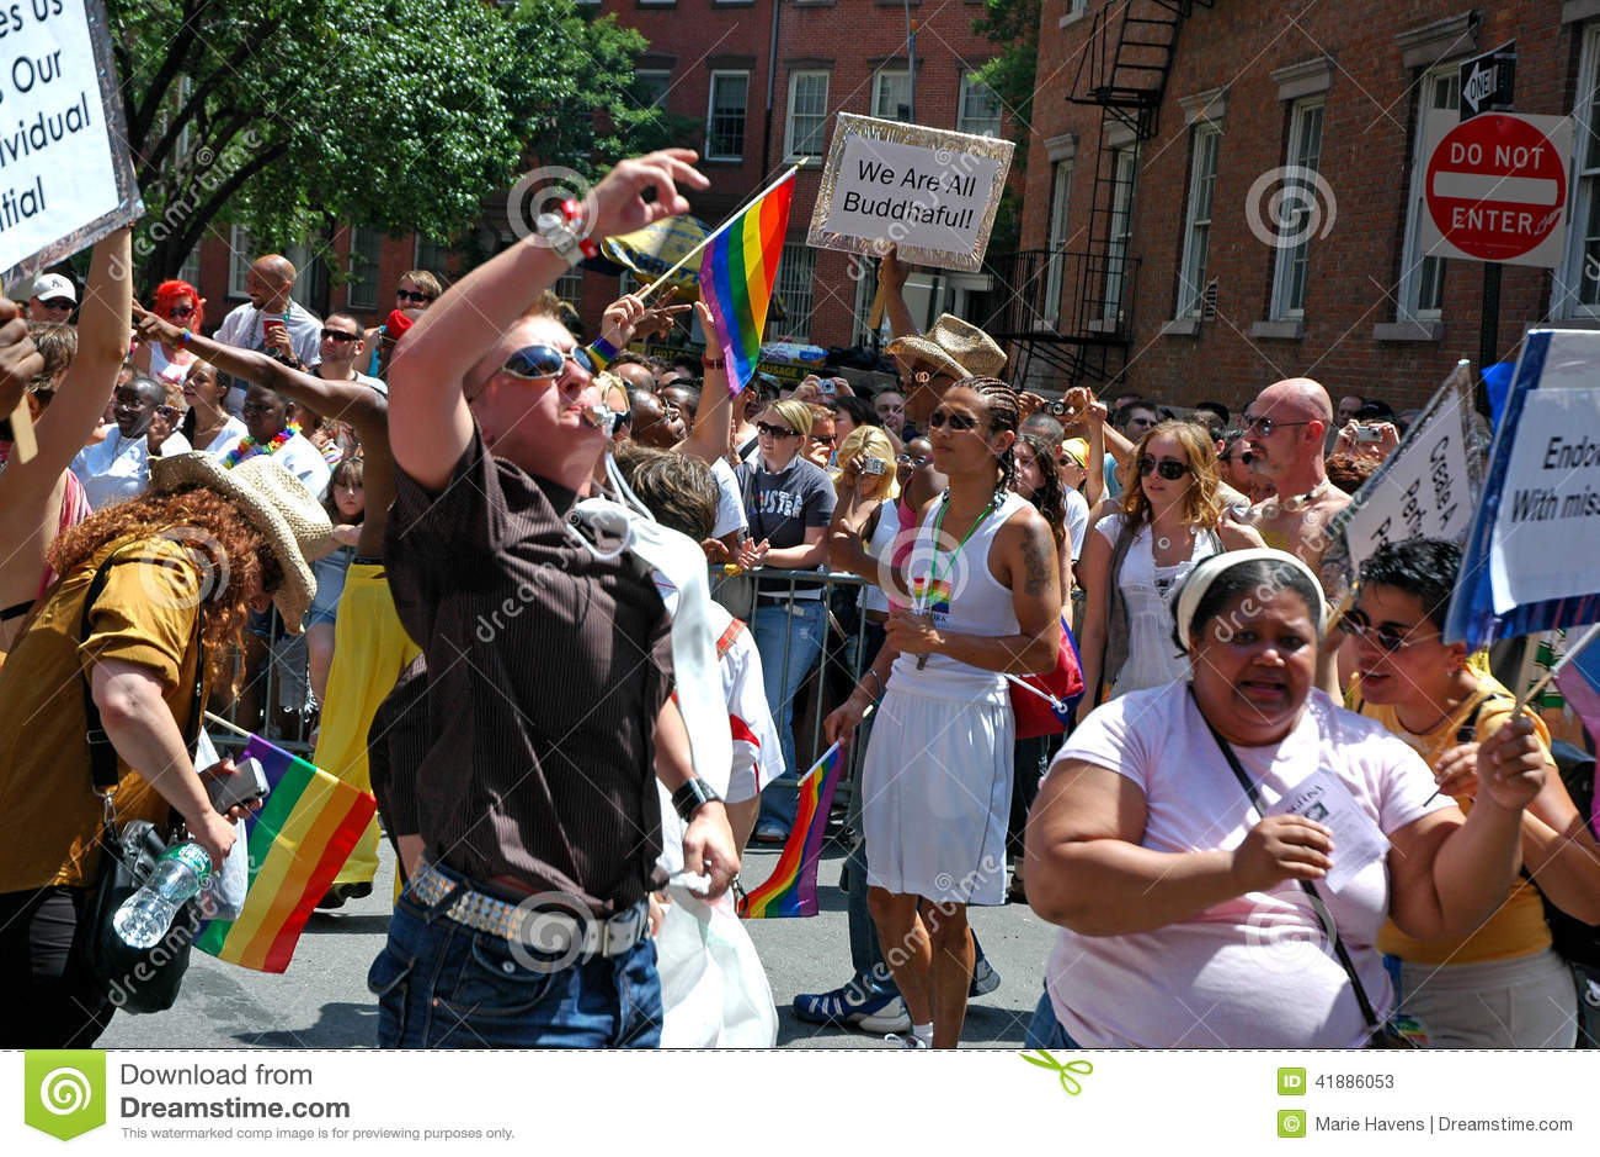 Gay download sites